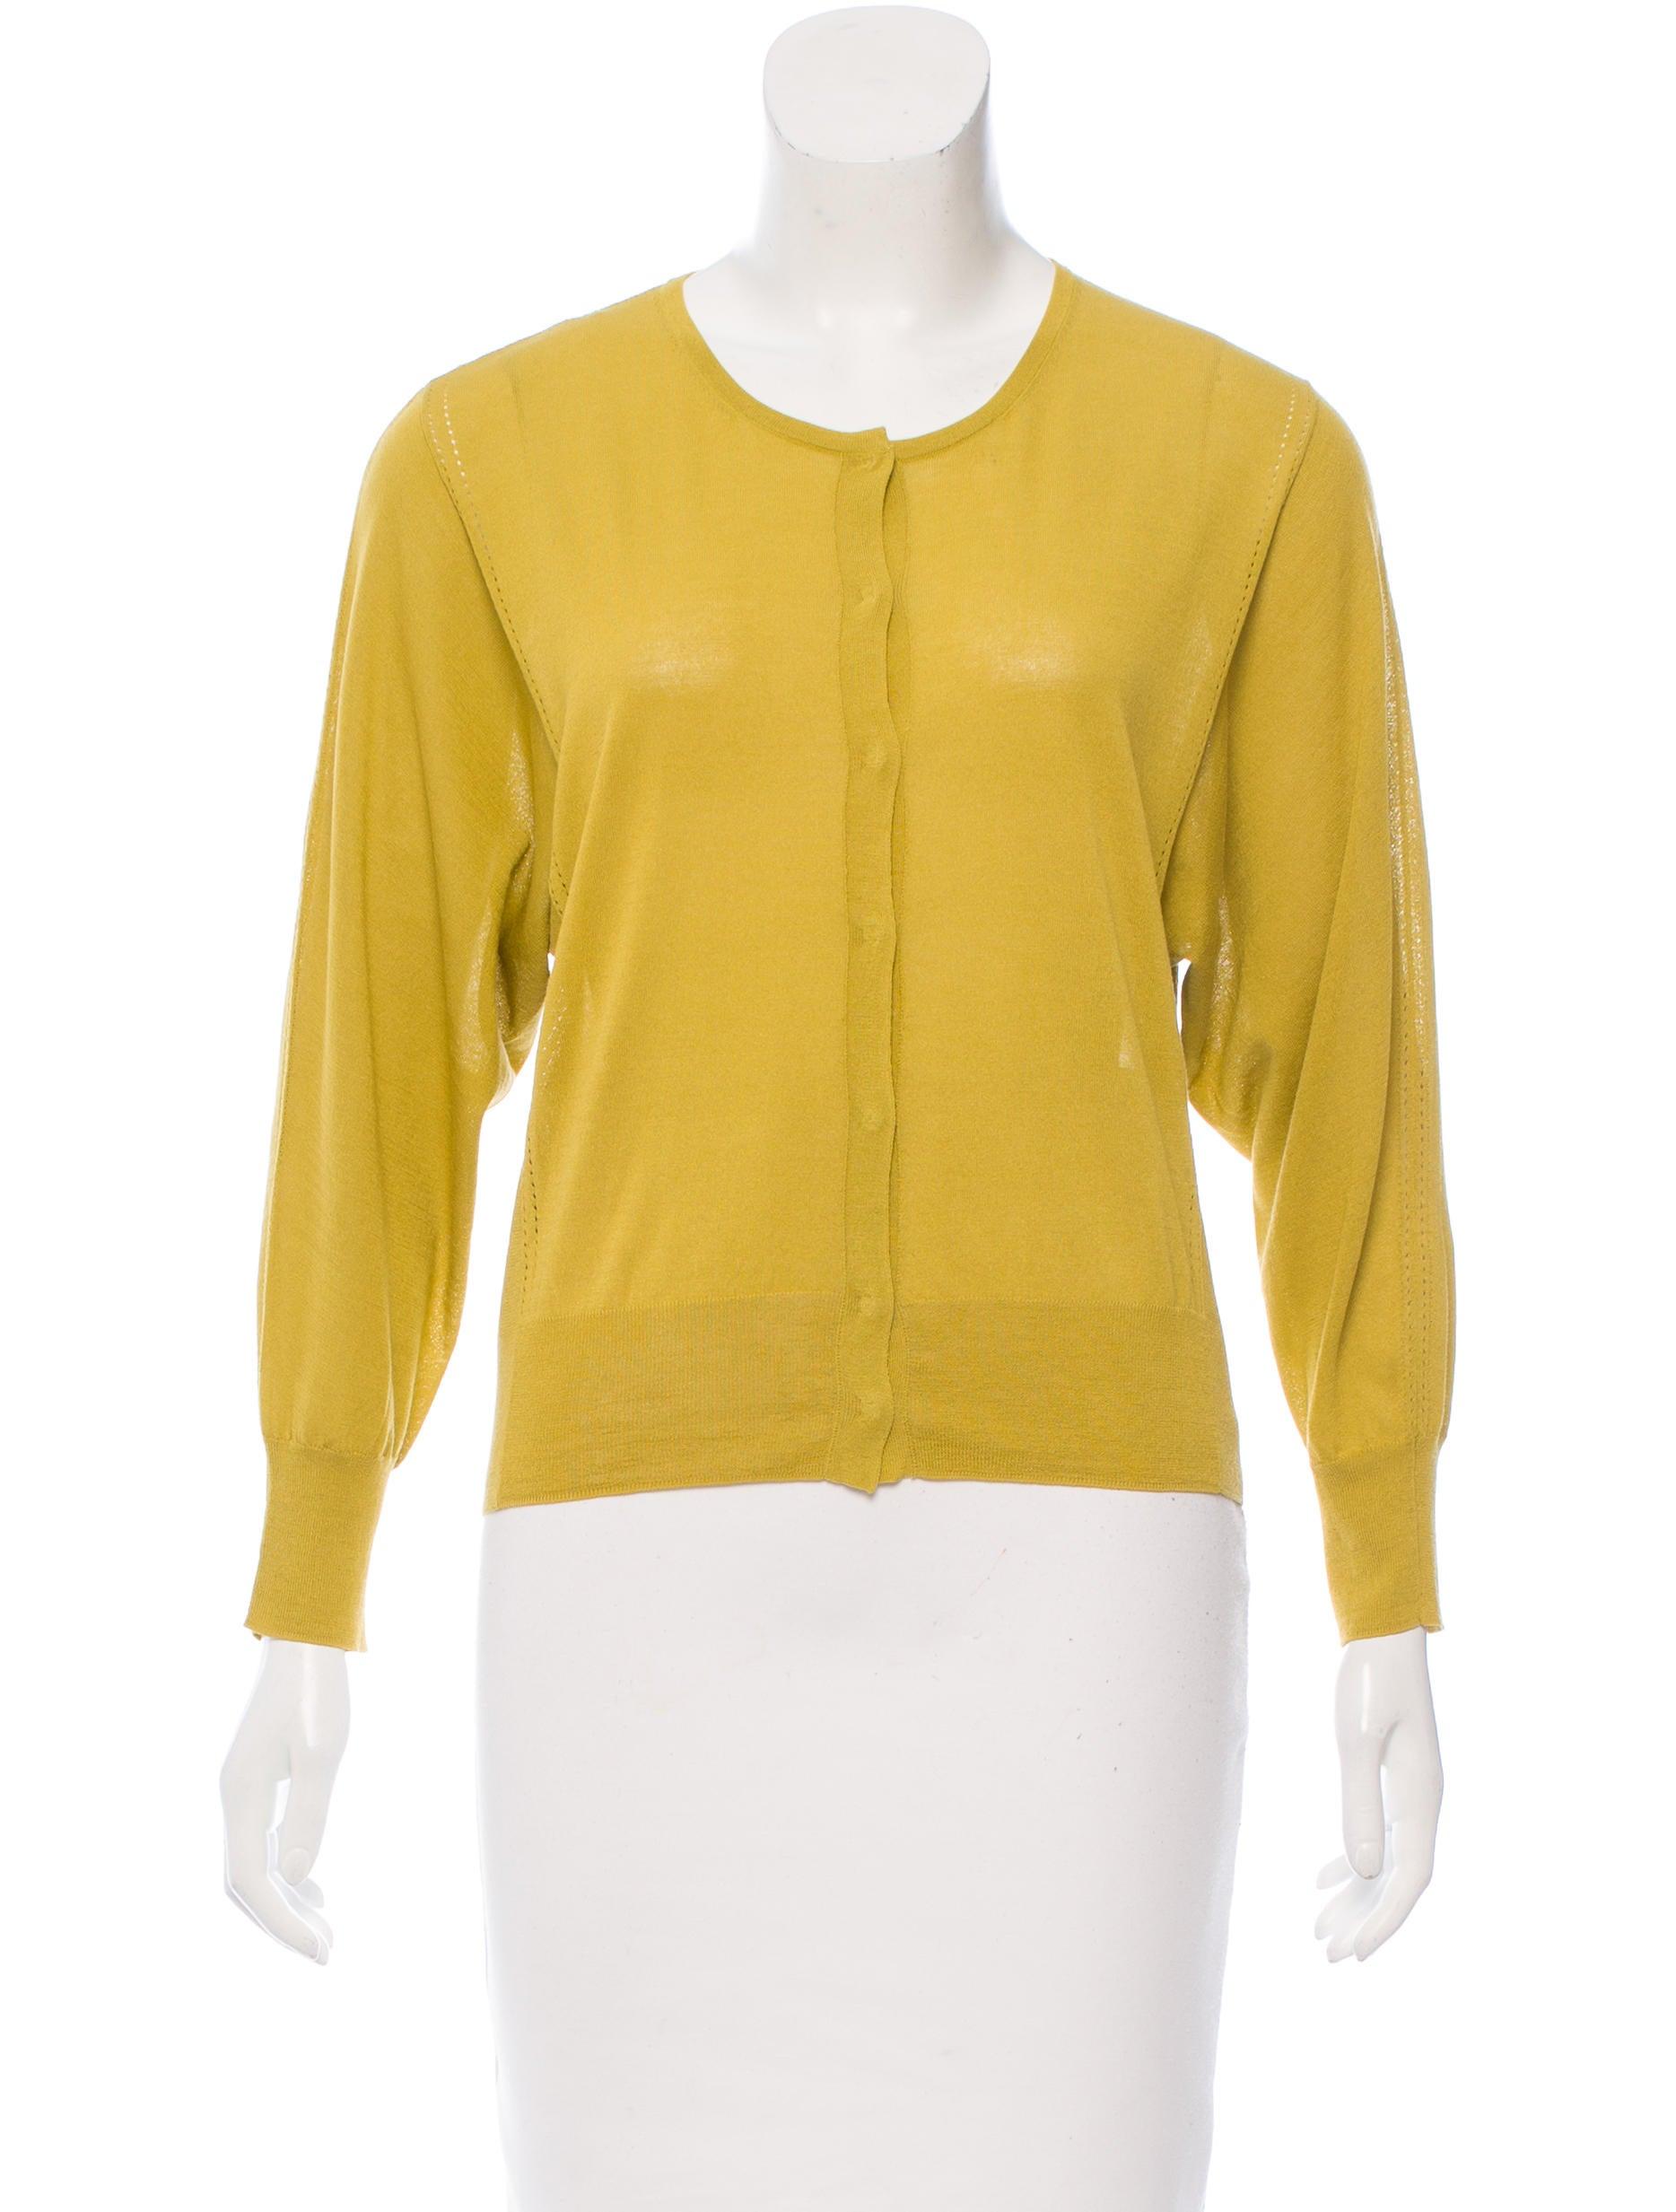 Dries Van Noten Cropped Knit Cardigan - Clothing - DRI39471   The ...